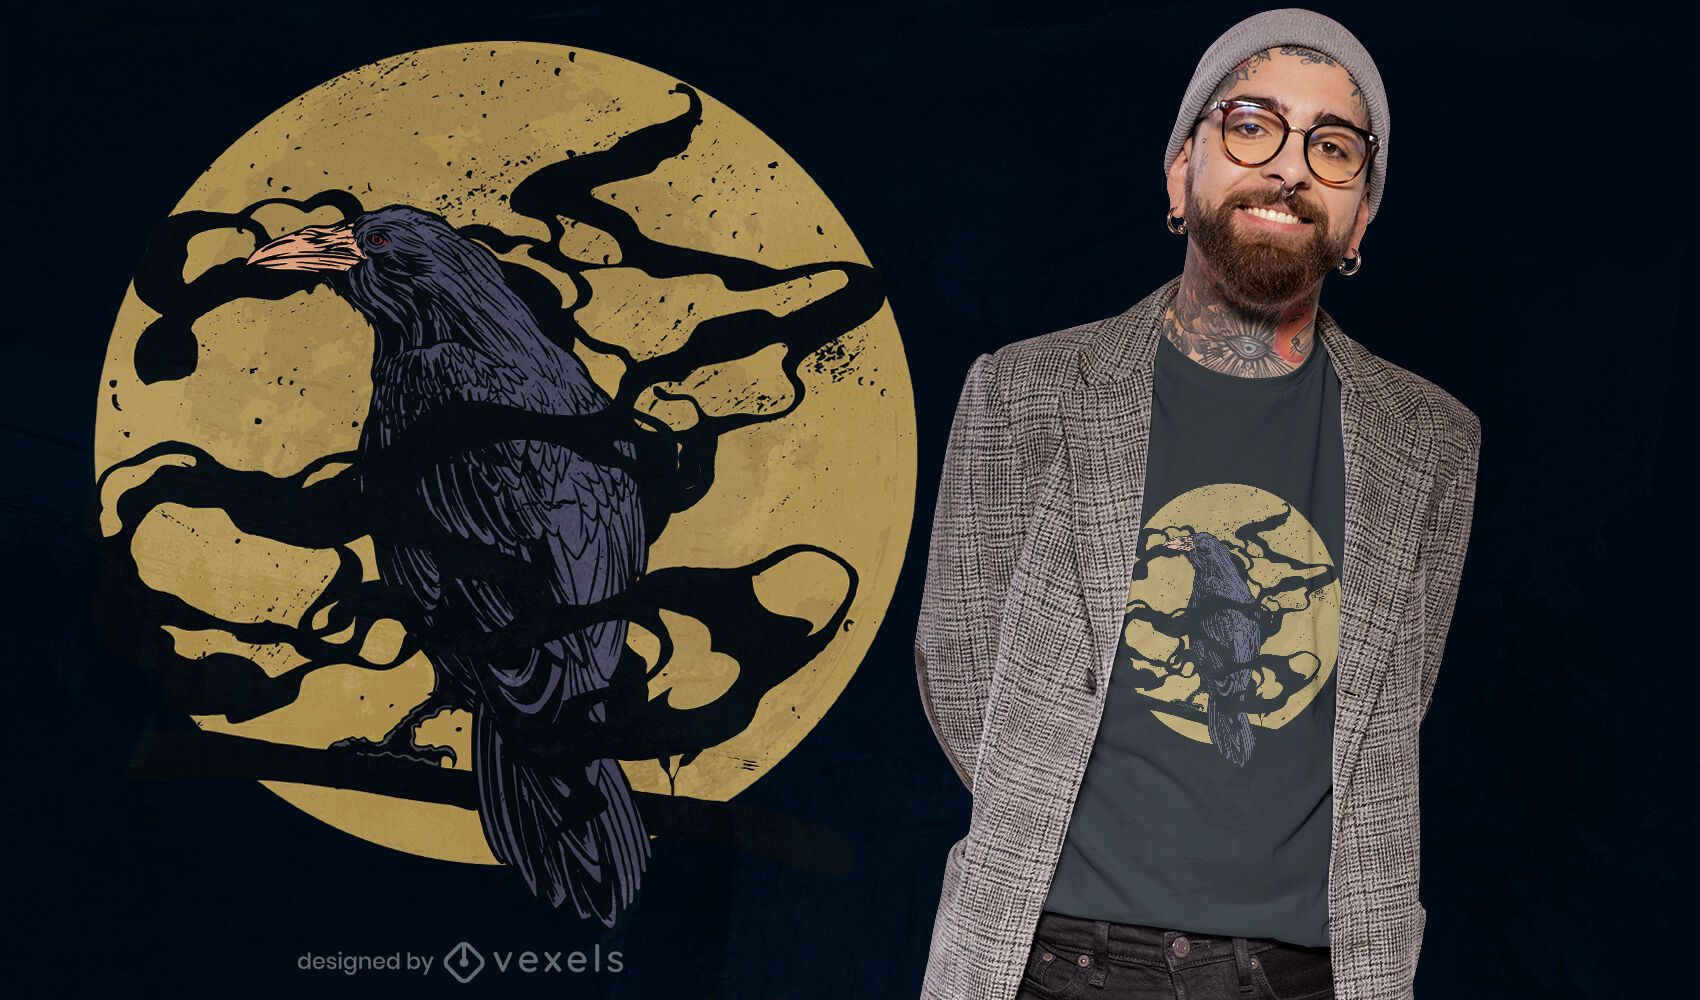 Raven and moon creepy t-shirt design